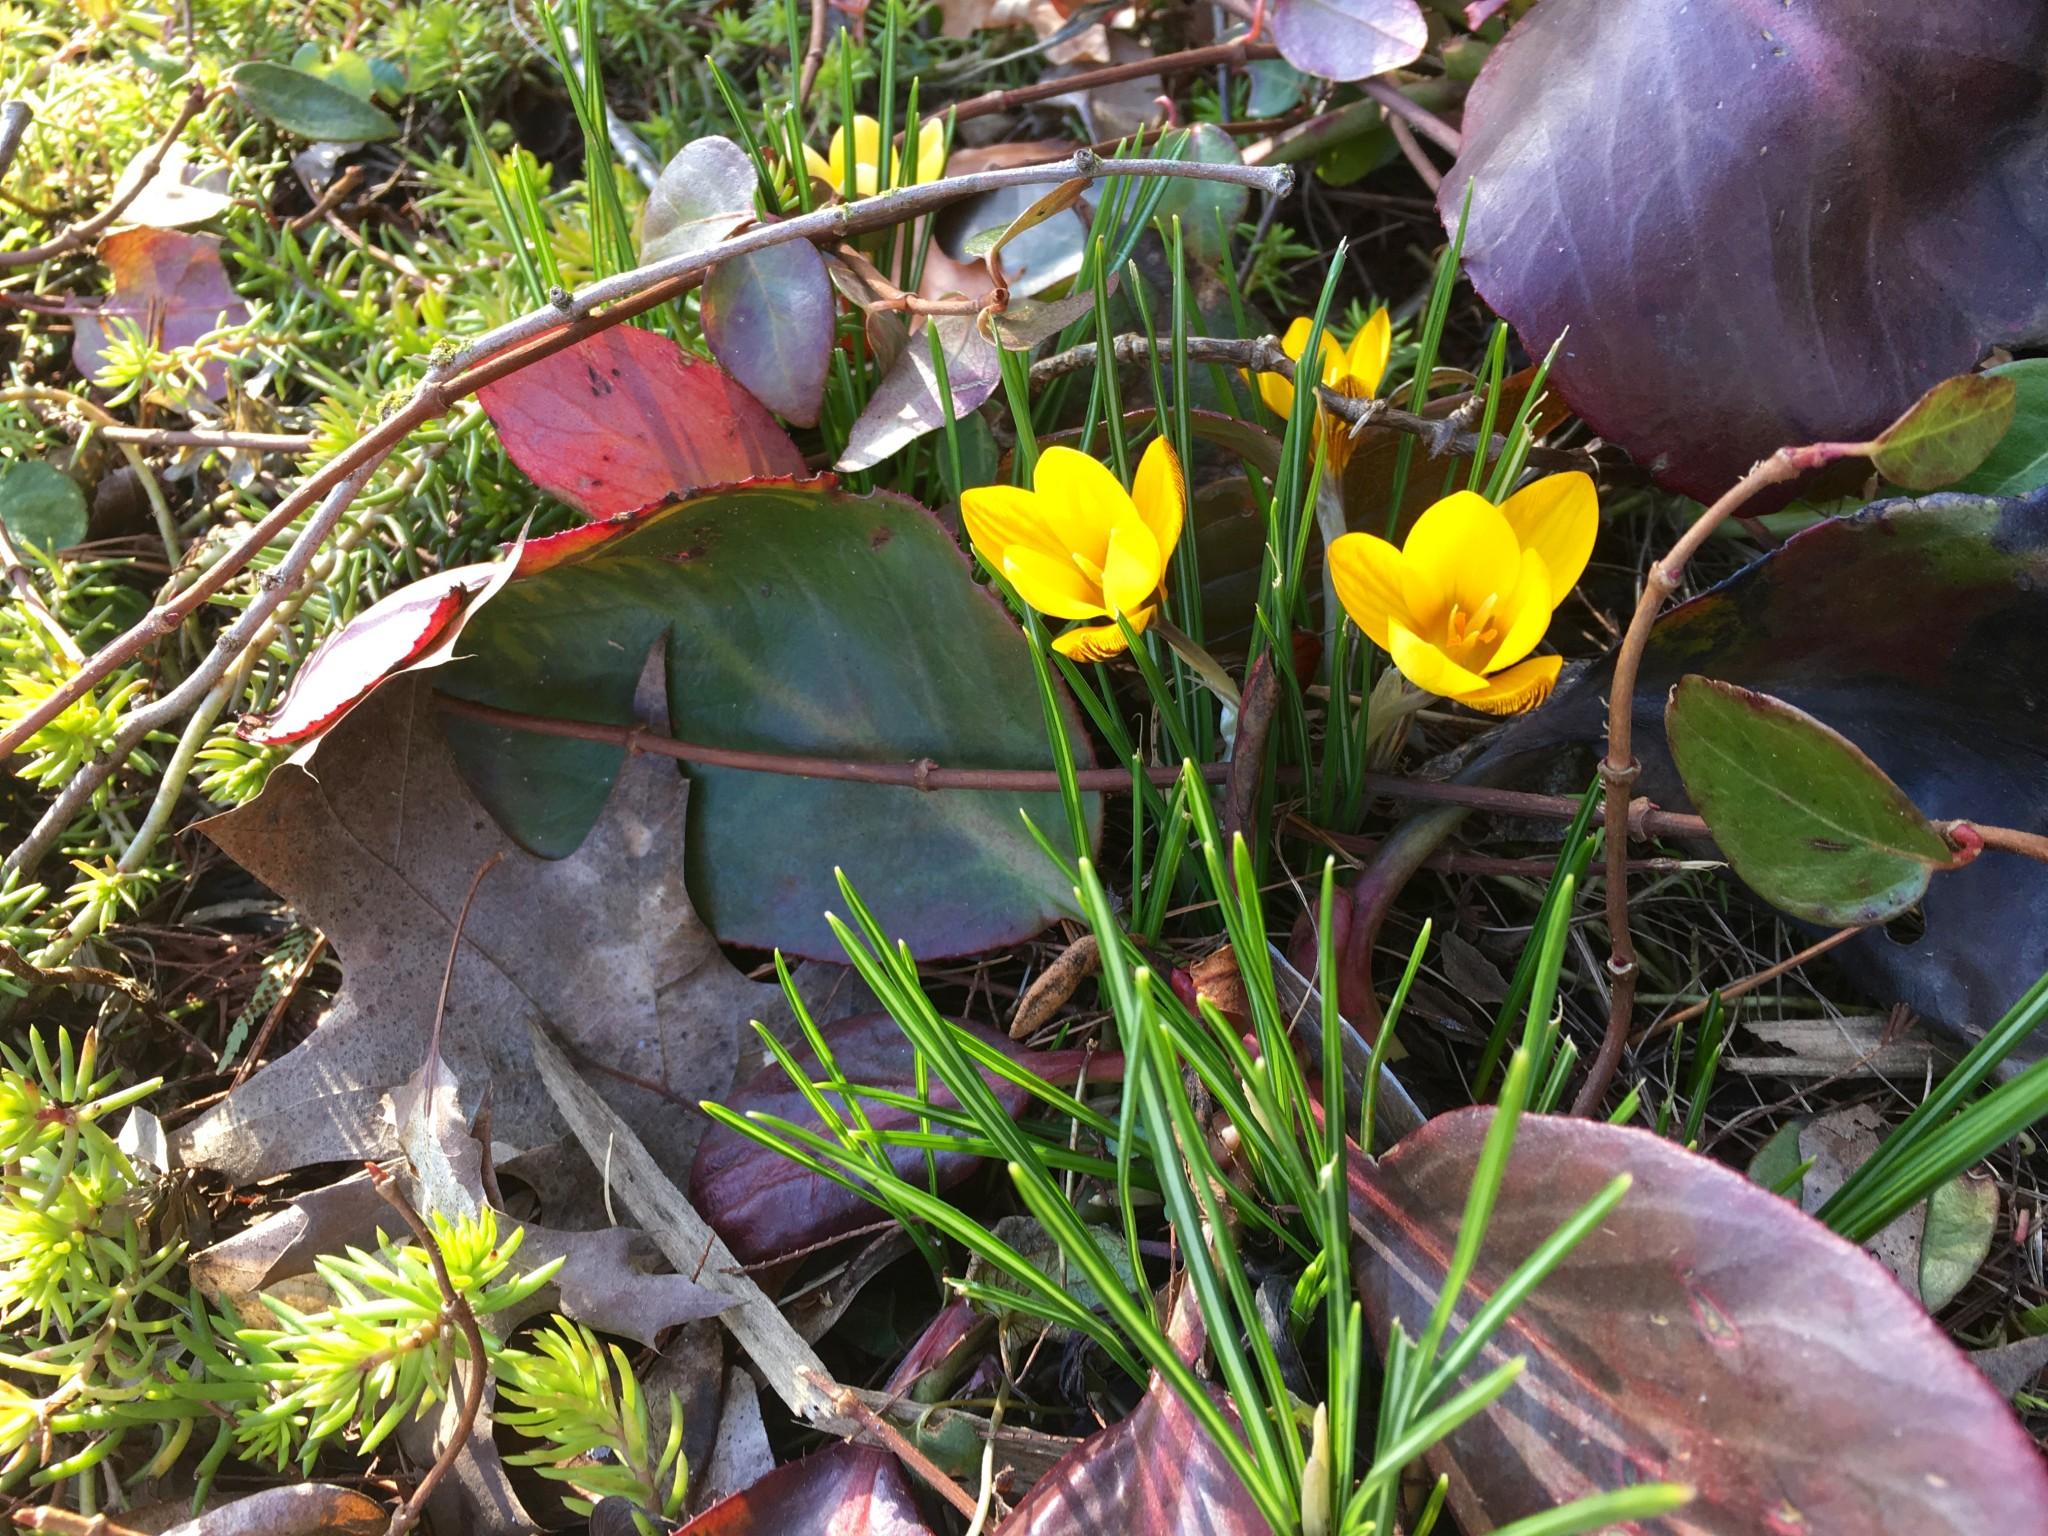 Little yellow flower encountered during neighborhood stroll. Yay.